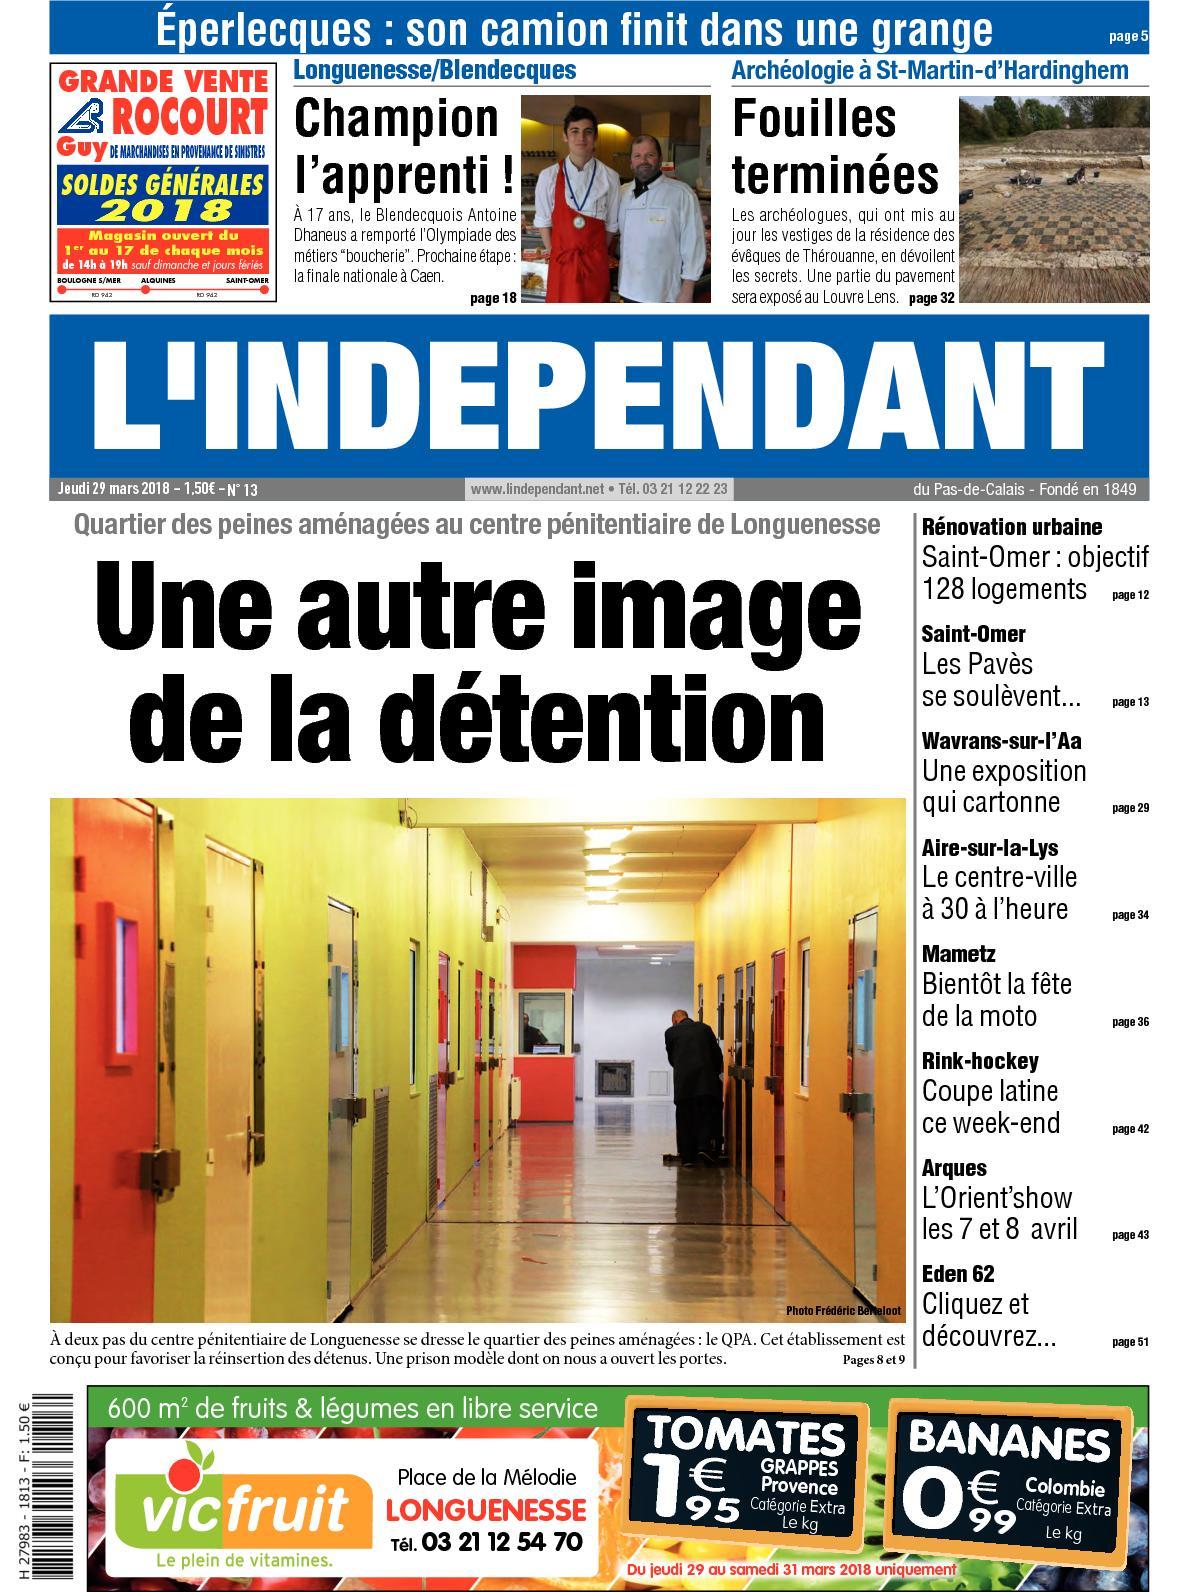 b683d1cbfbf4 Calaméo - L indépendant Semaine 13 2018